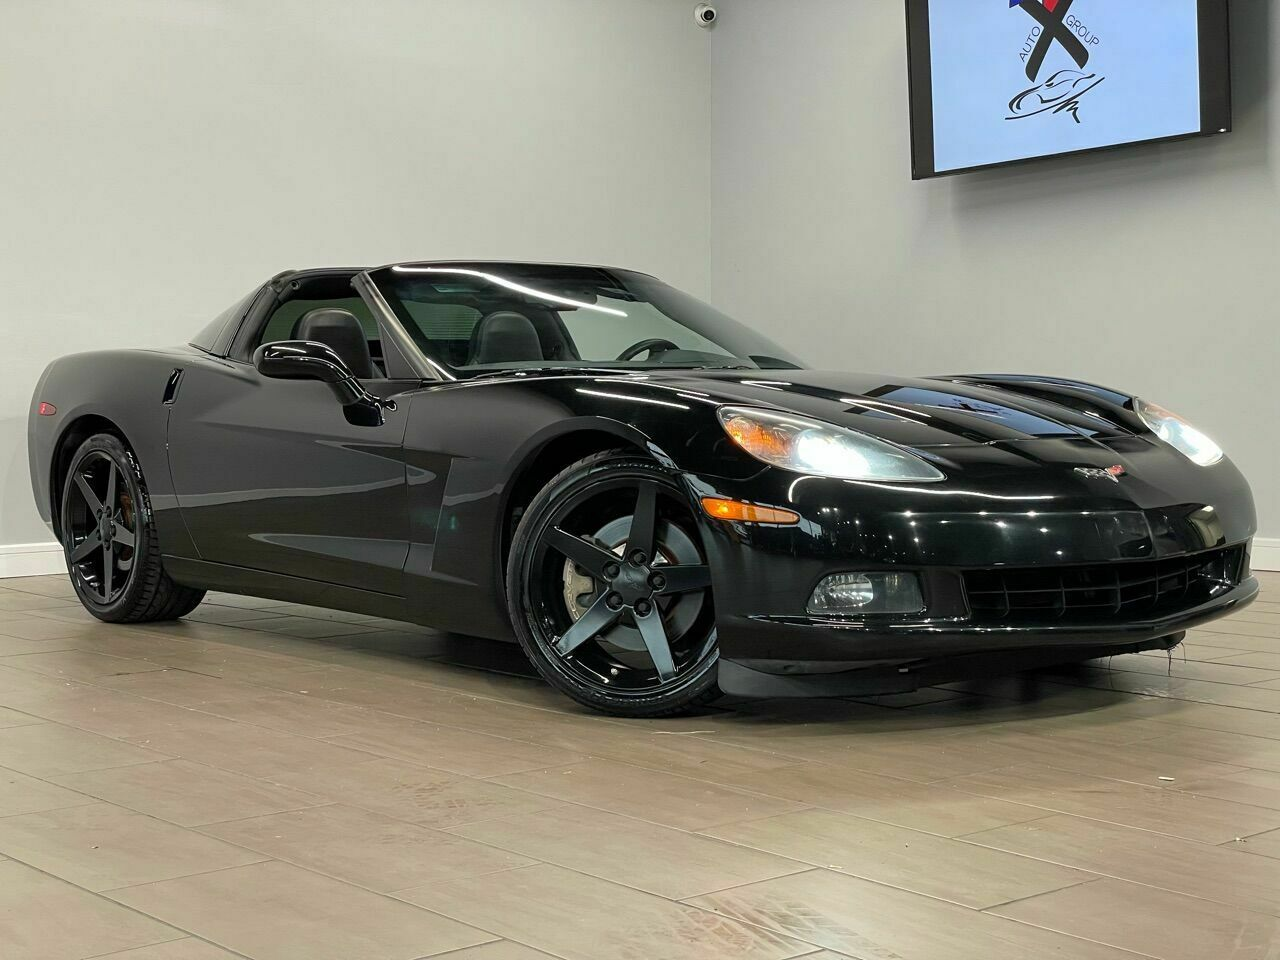 2010 Black Chevrolet Corvette     C6 Corvette Photo 1